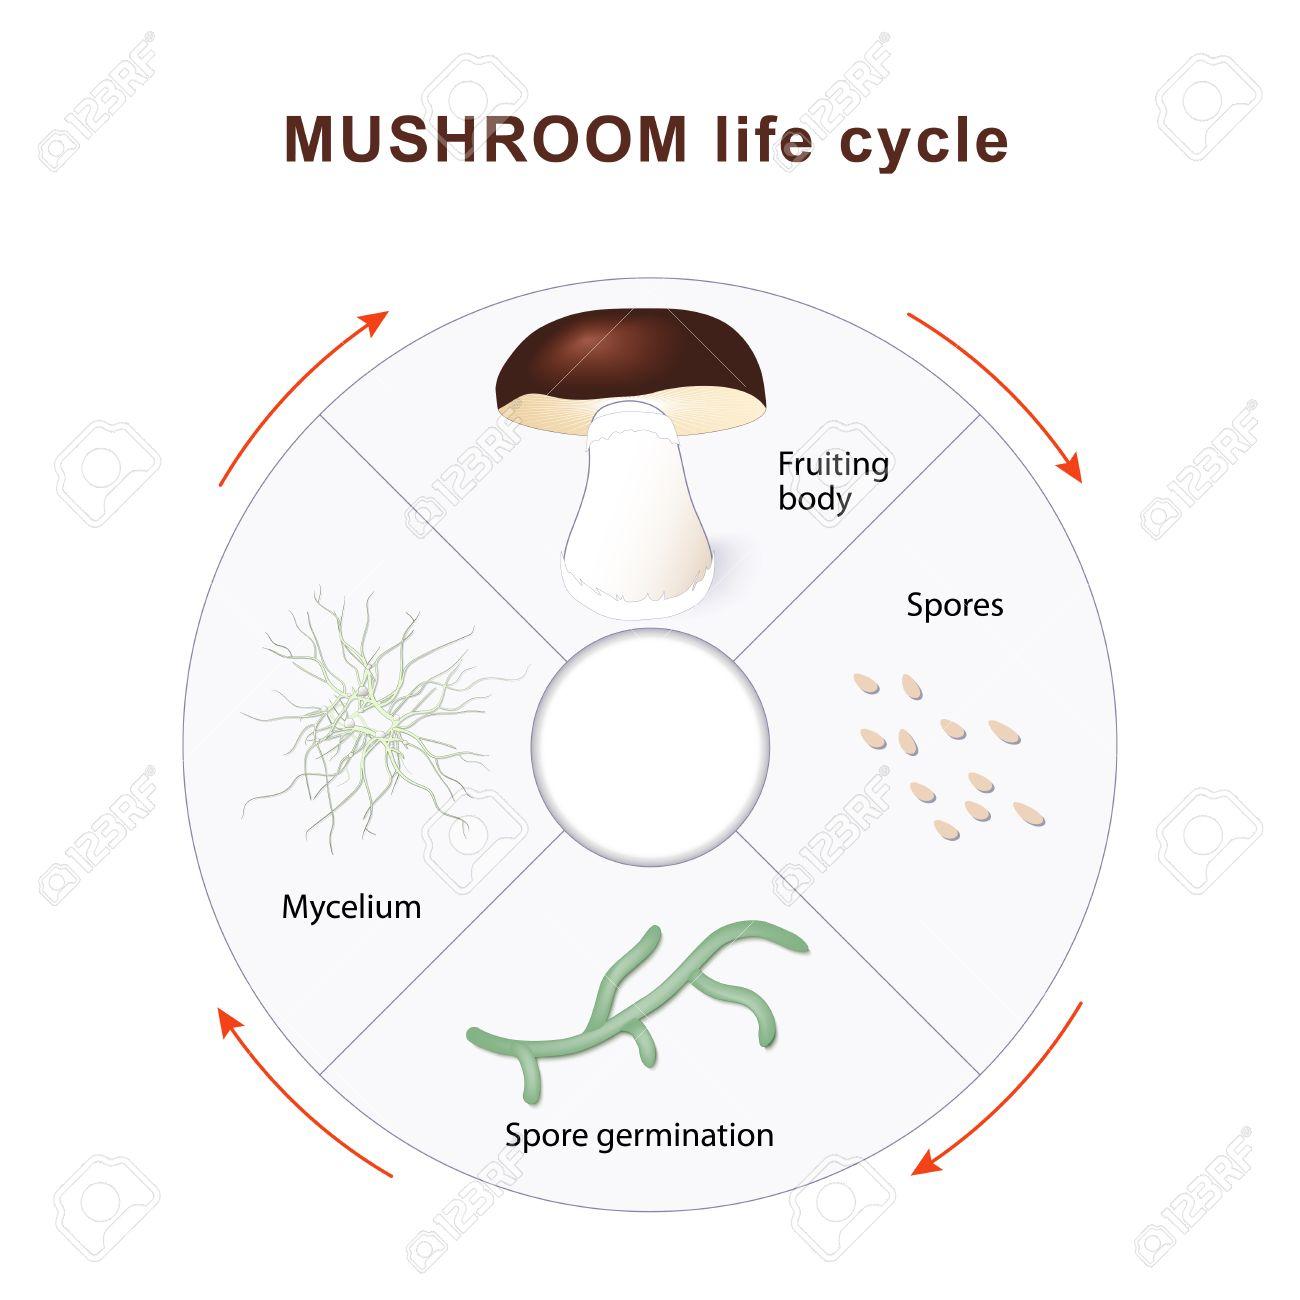 diagram of a mushroom mushroom life cycle mushrooms and vegetation reproduction fungus diagram of a typical mushroom mushroom life cycle mushrooms and